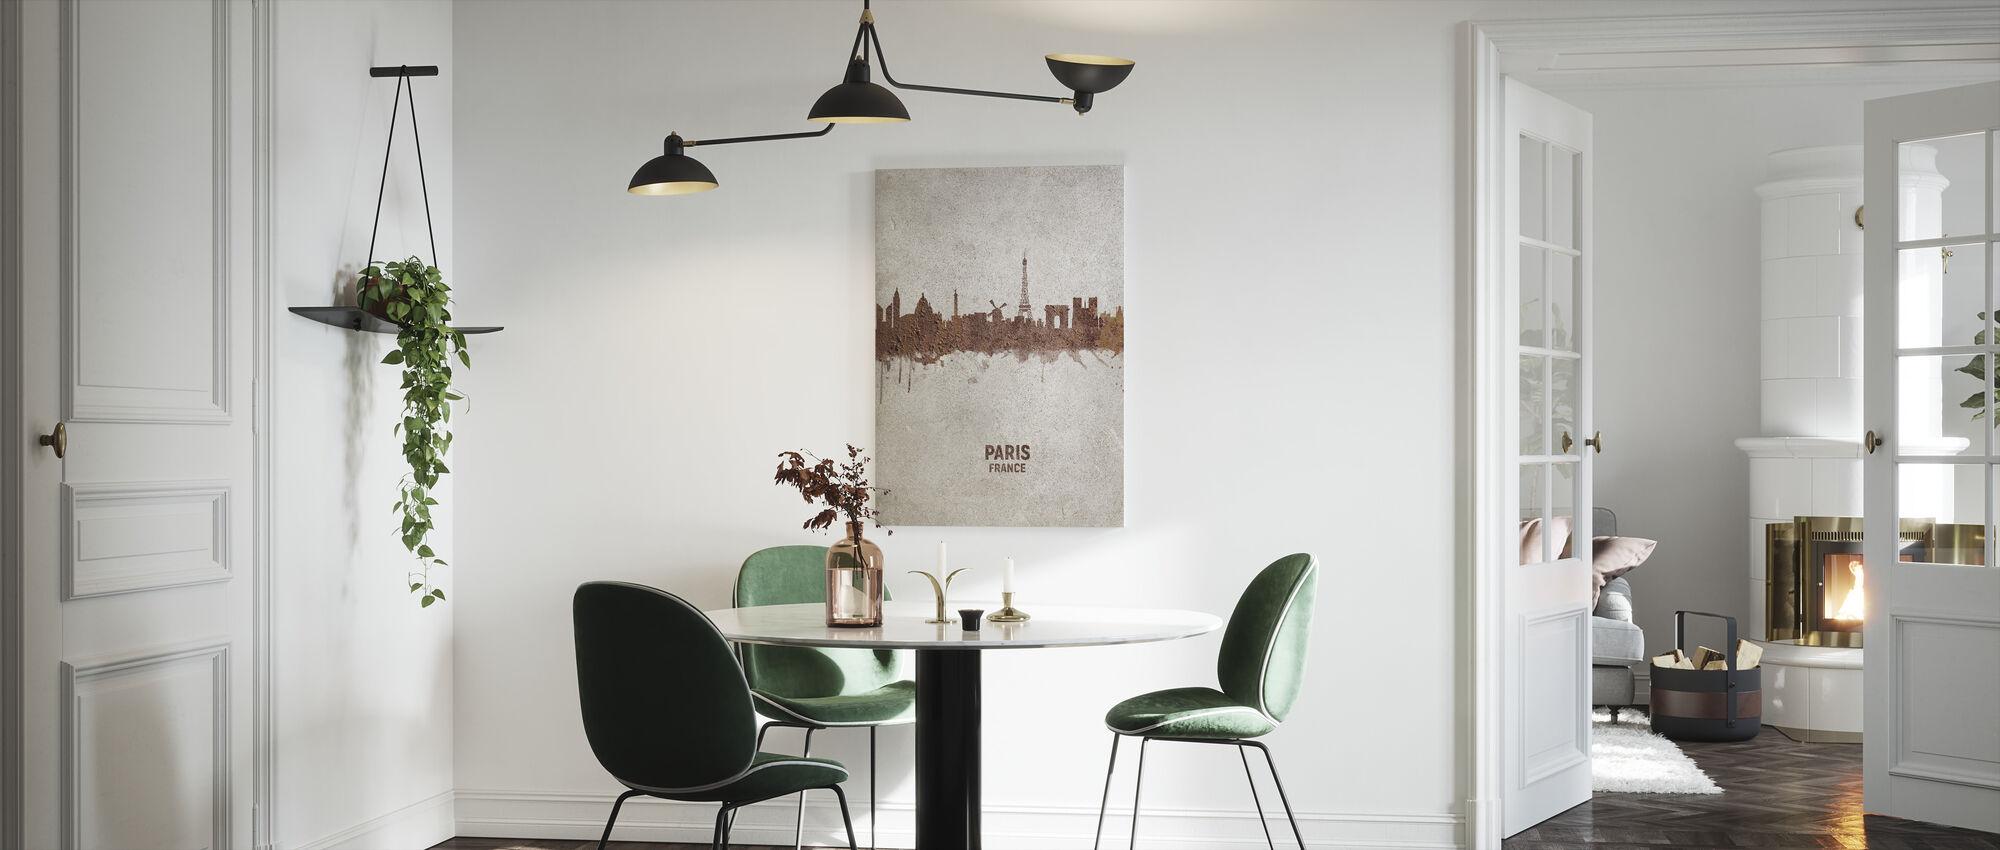 Paris France Rust Skyline - Canvas print - Kitchen